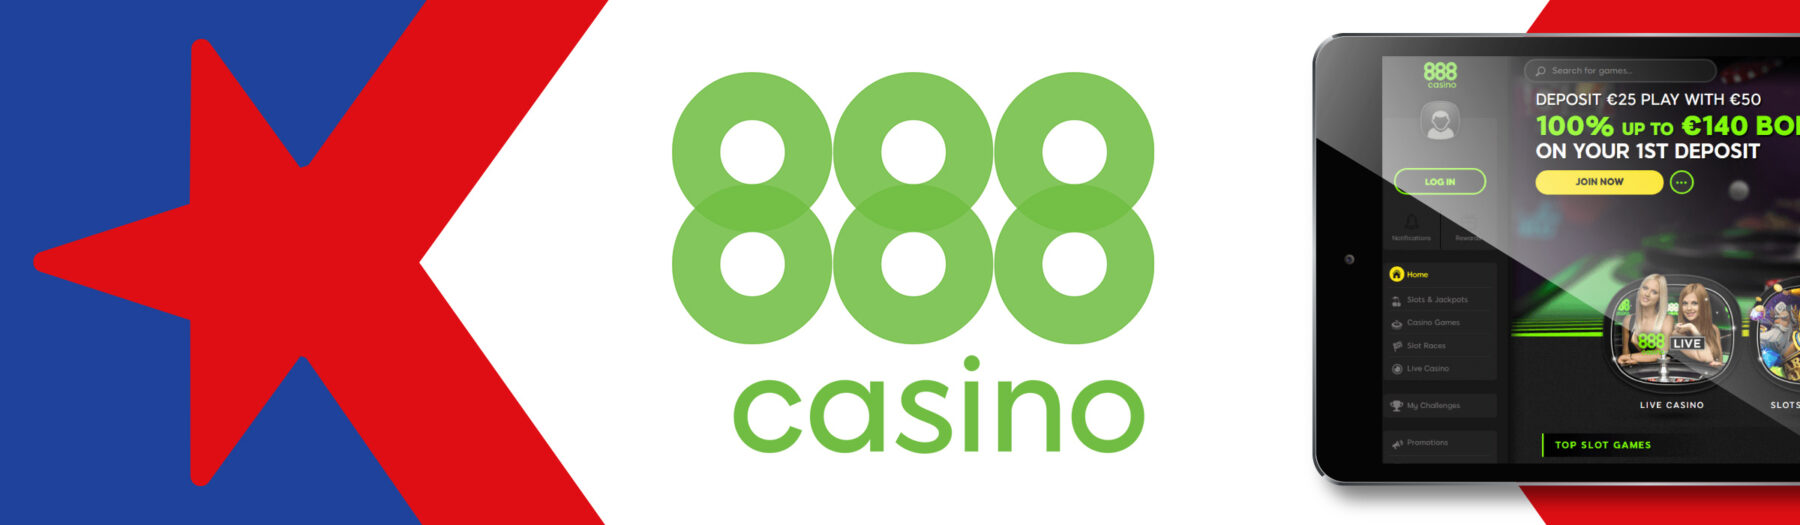 Bonos Casino en 888 Casino Chile